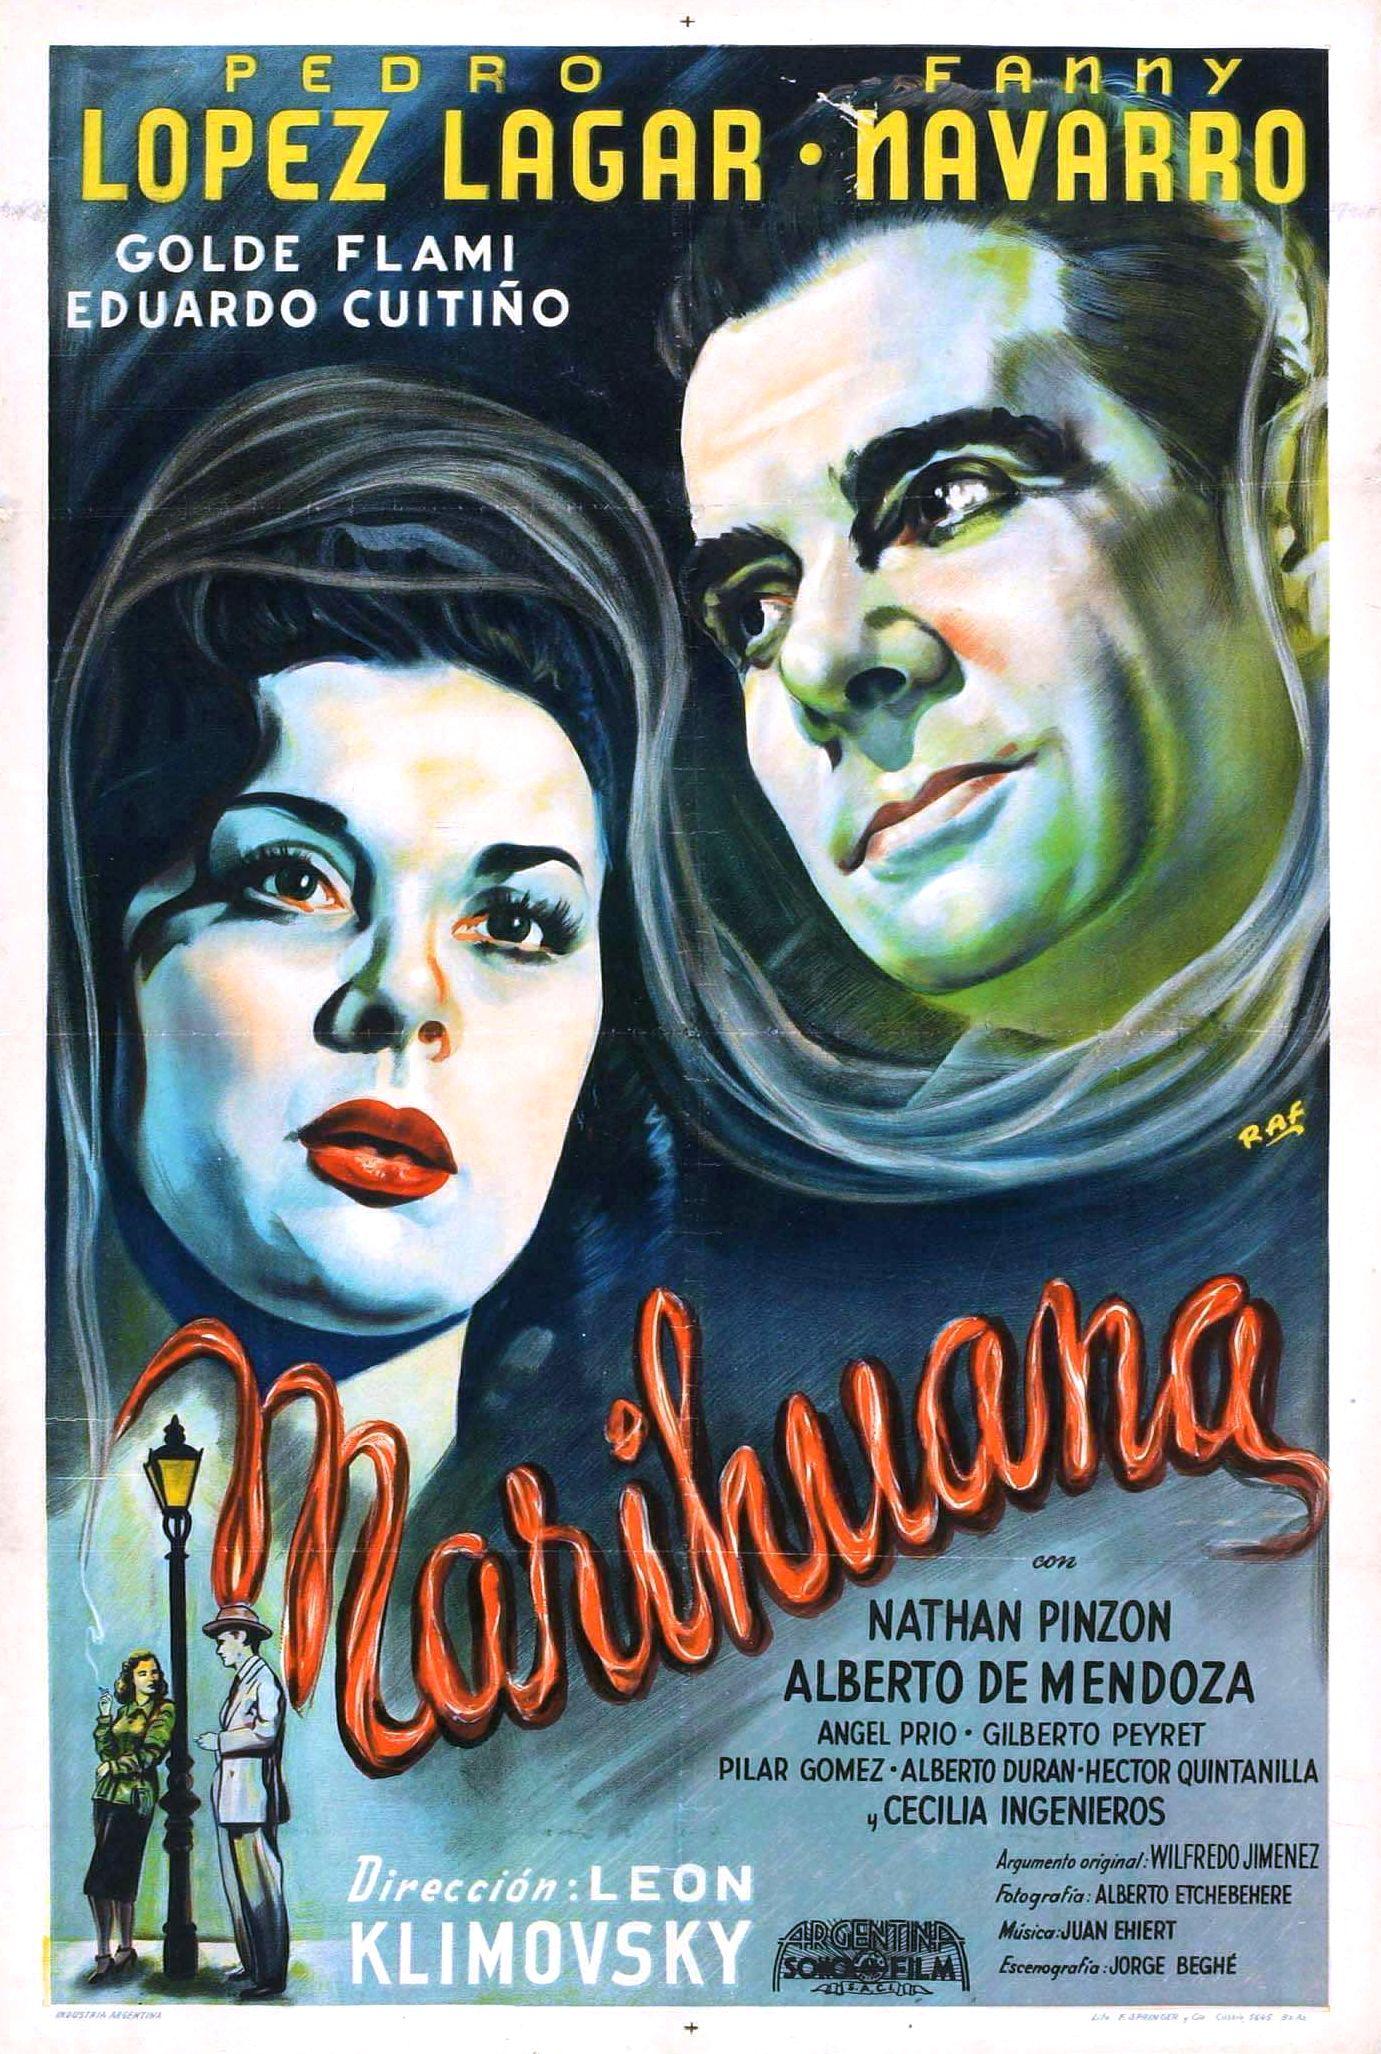 marihuana_story_1950_poster_01.jpg